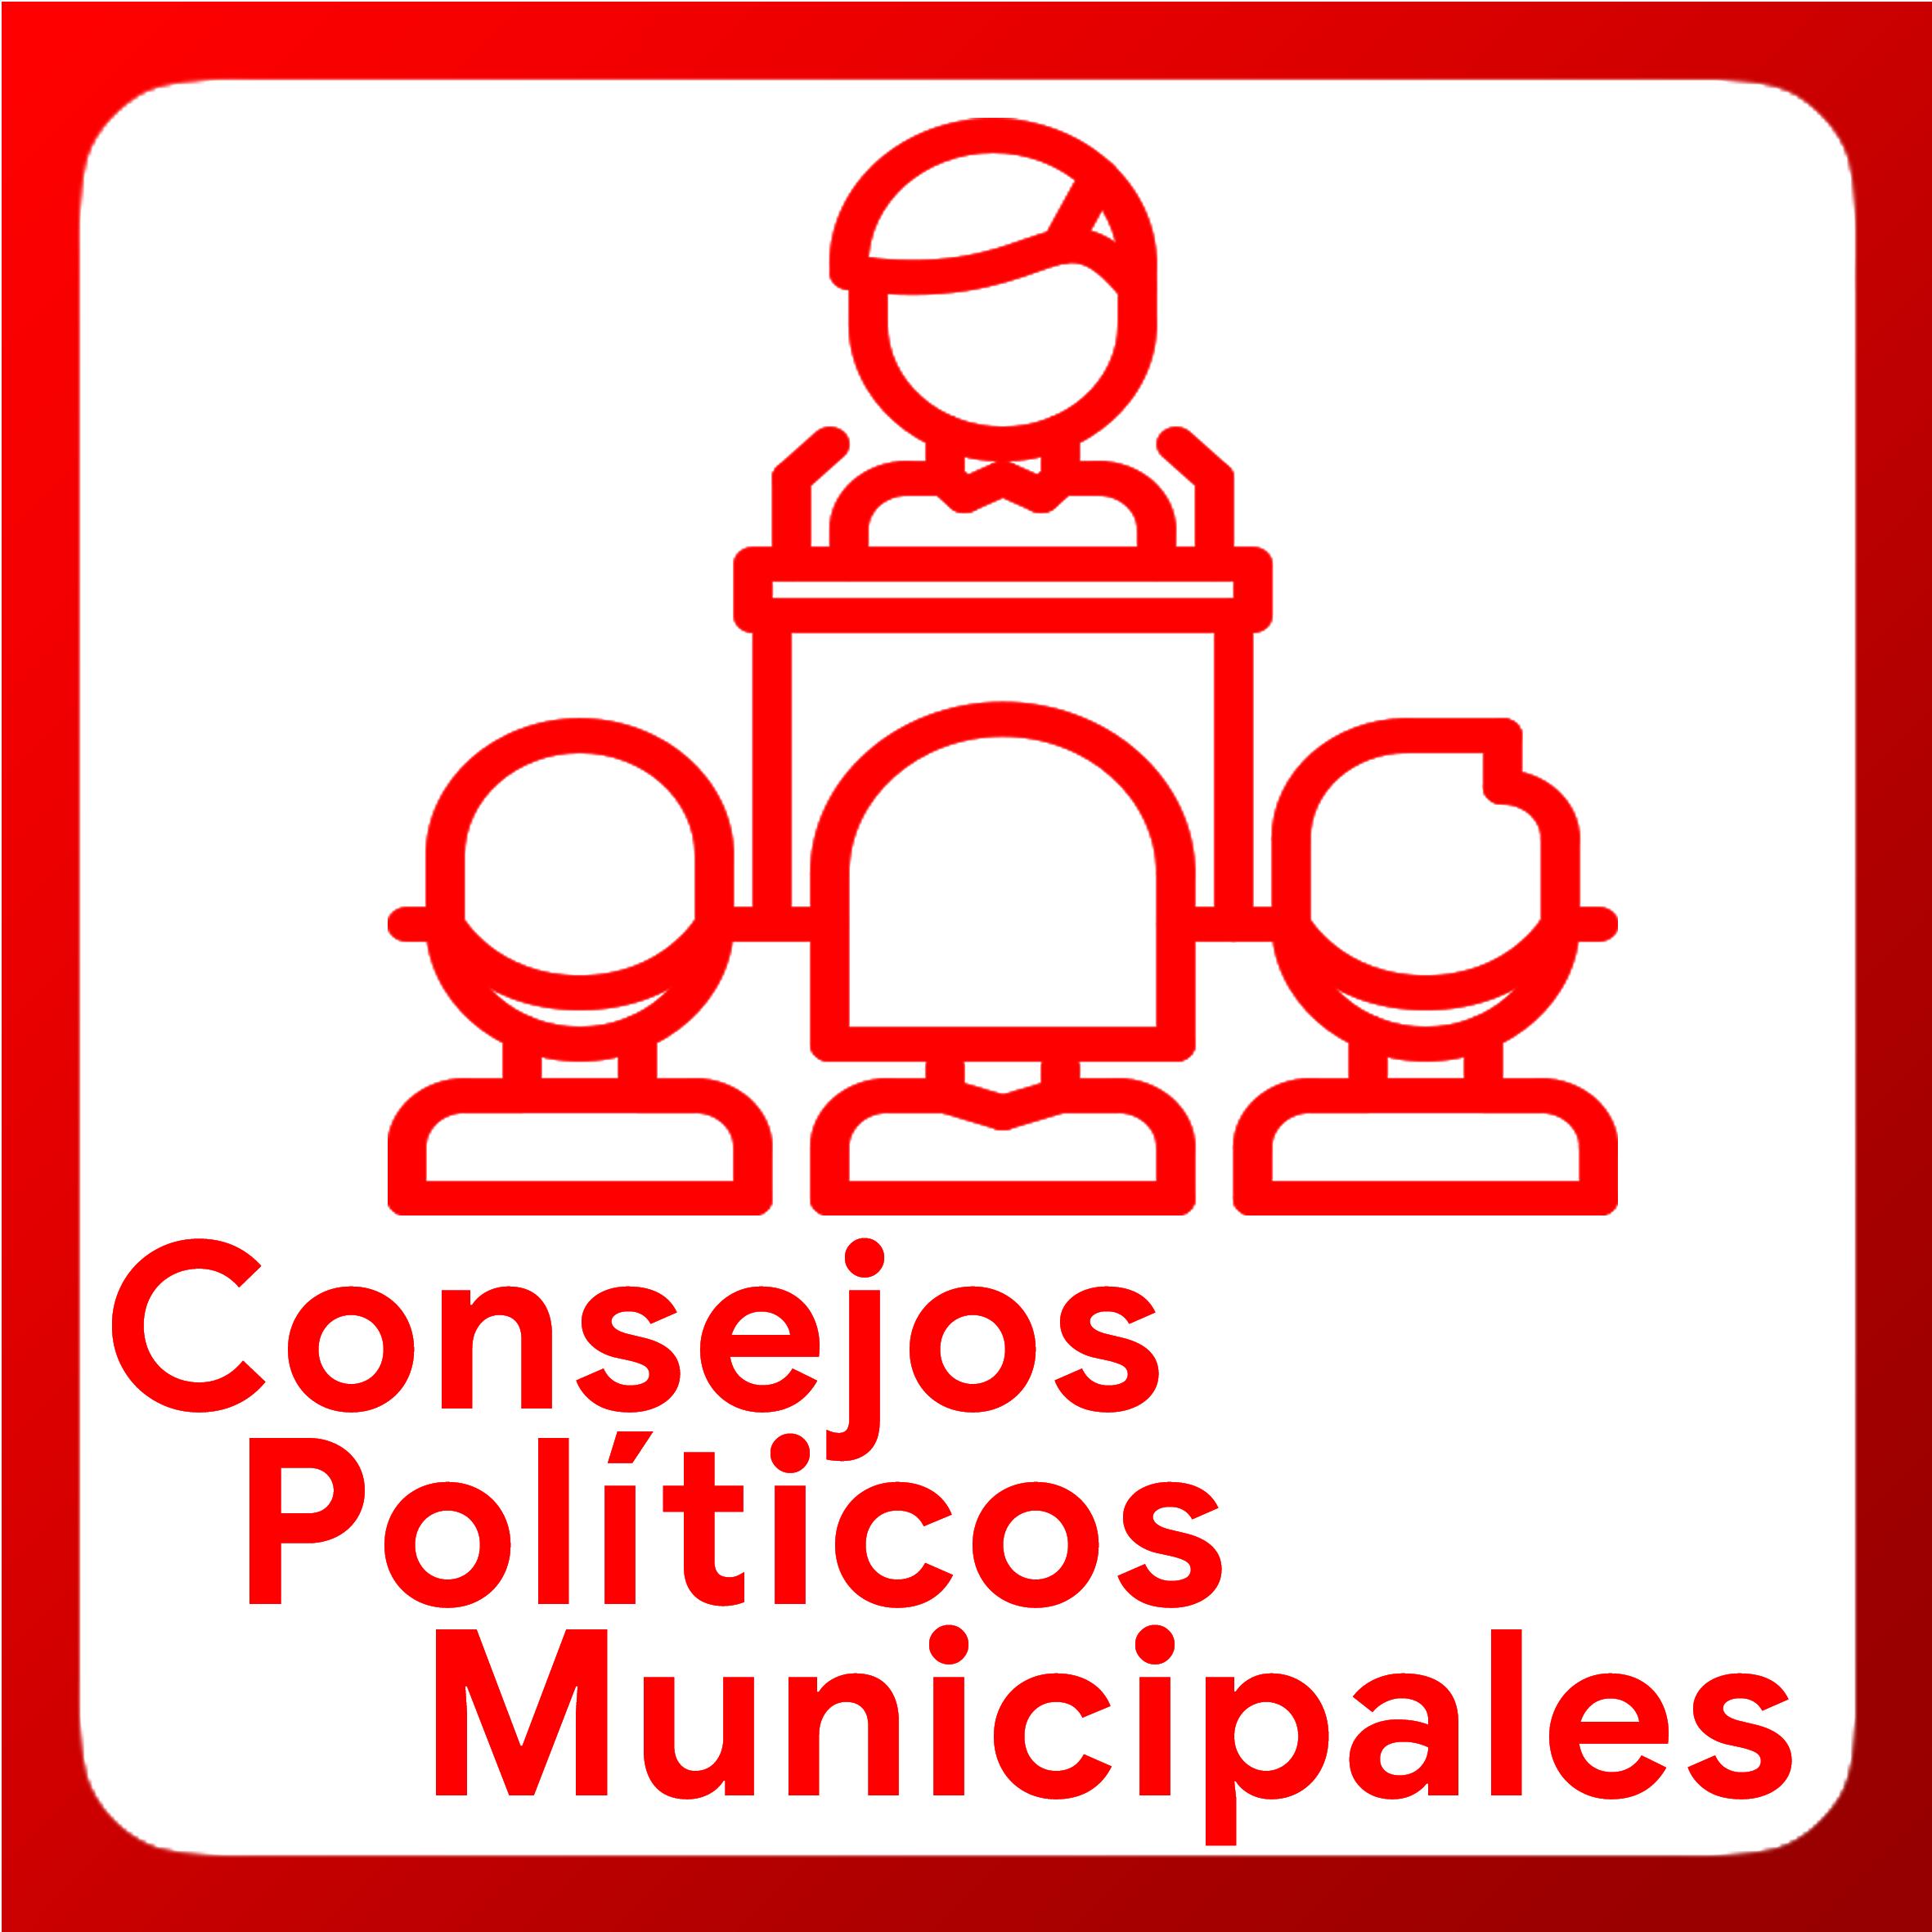 Boton activable de Consejos Políticos Municipales